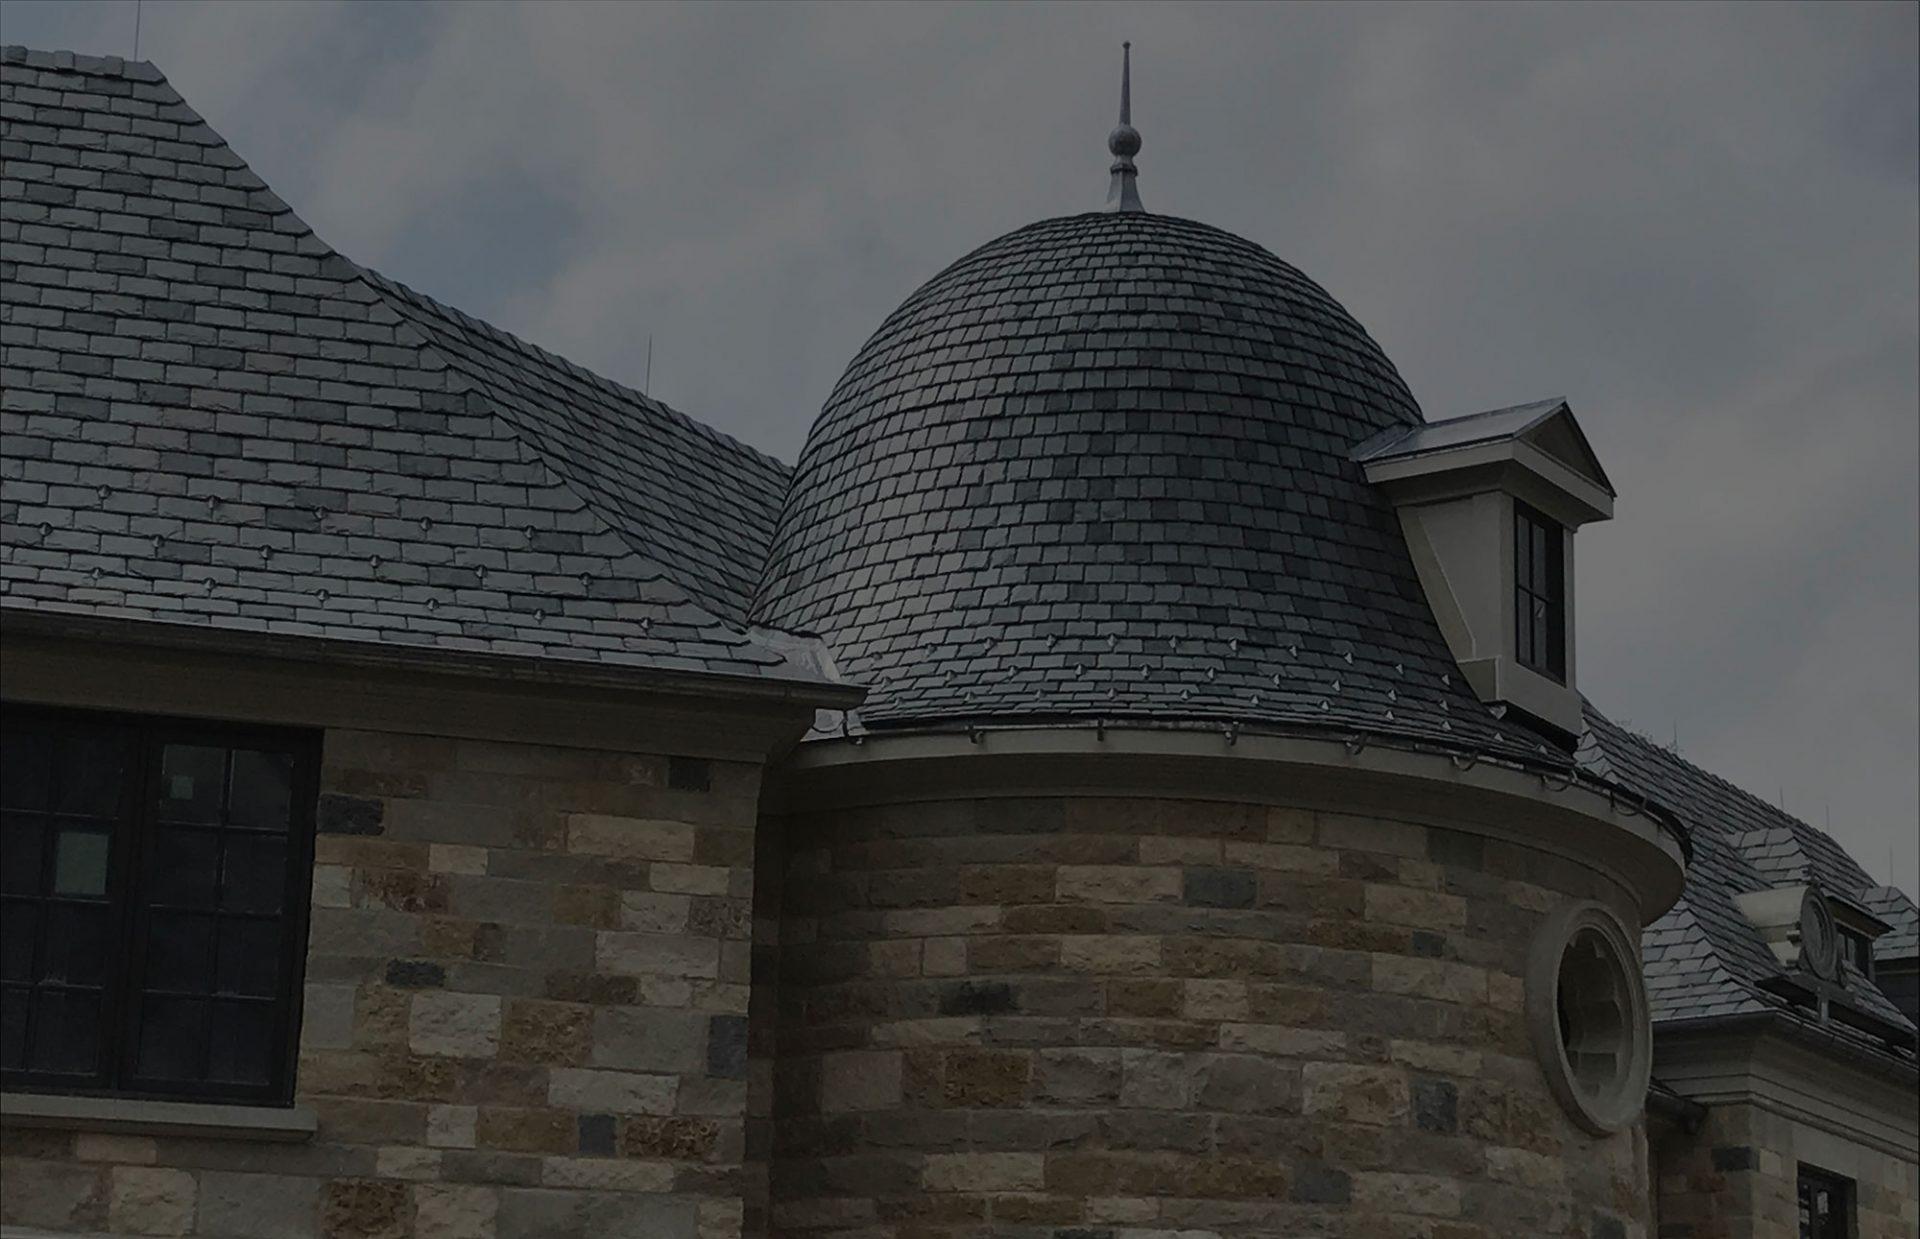 Gland roof